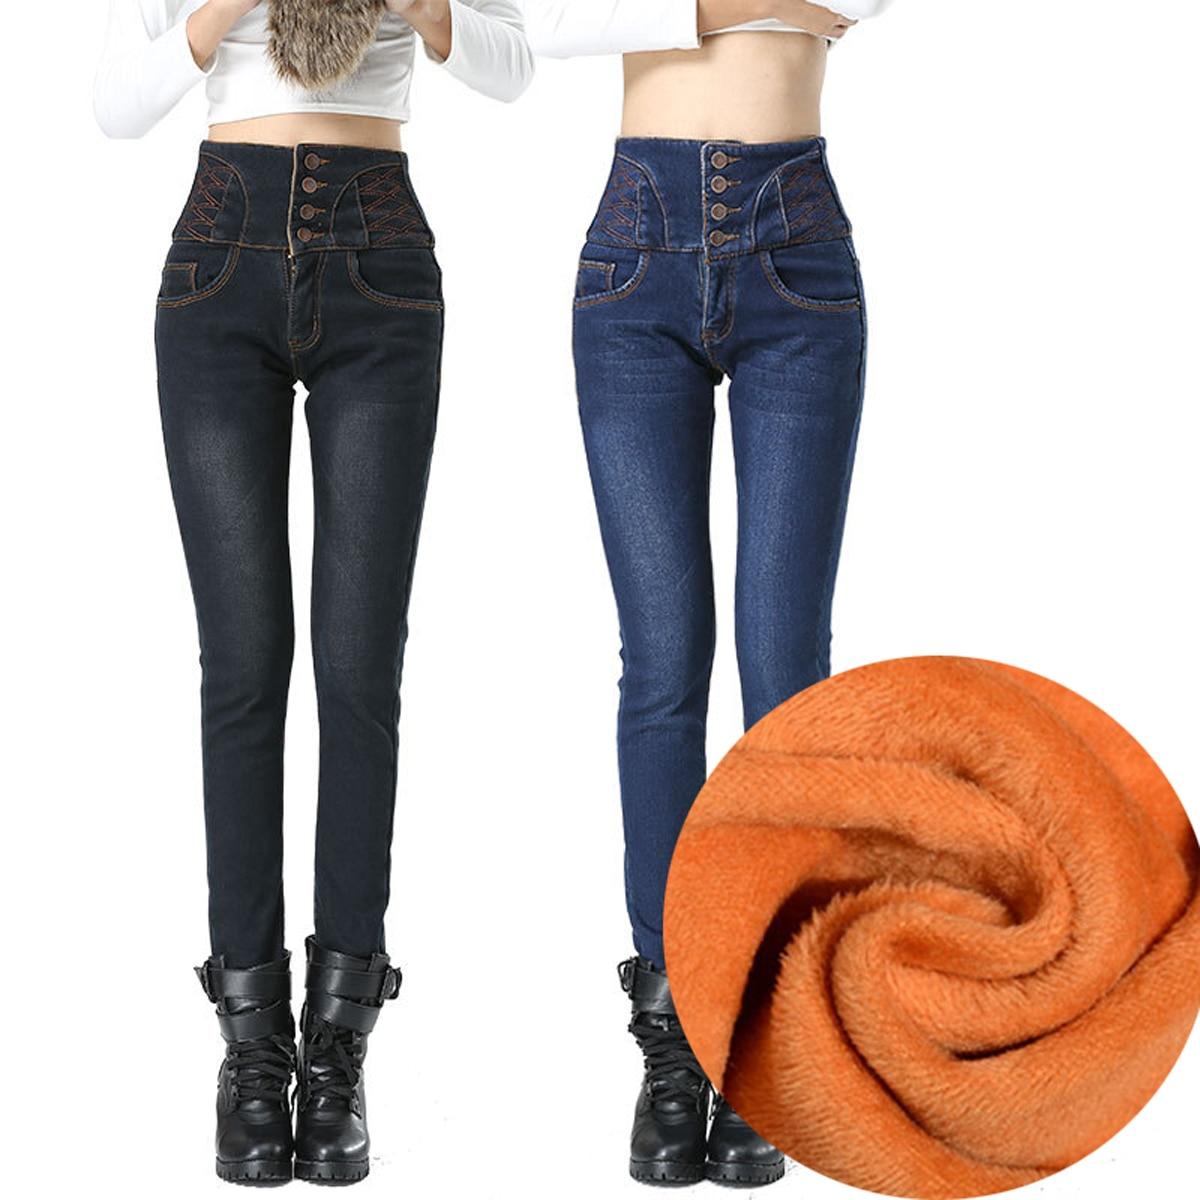 Tengo Winter Women Thickening High Waist Jeans Female Denim Warm Slim Trousers